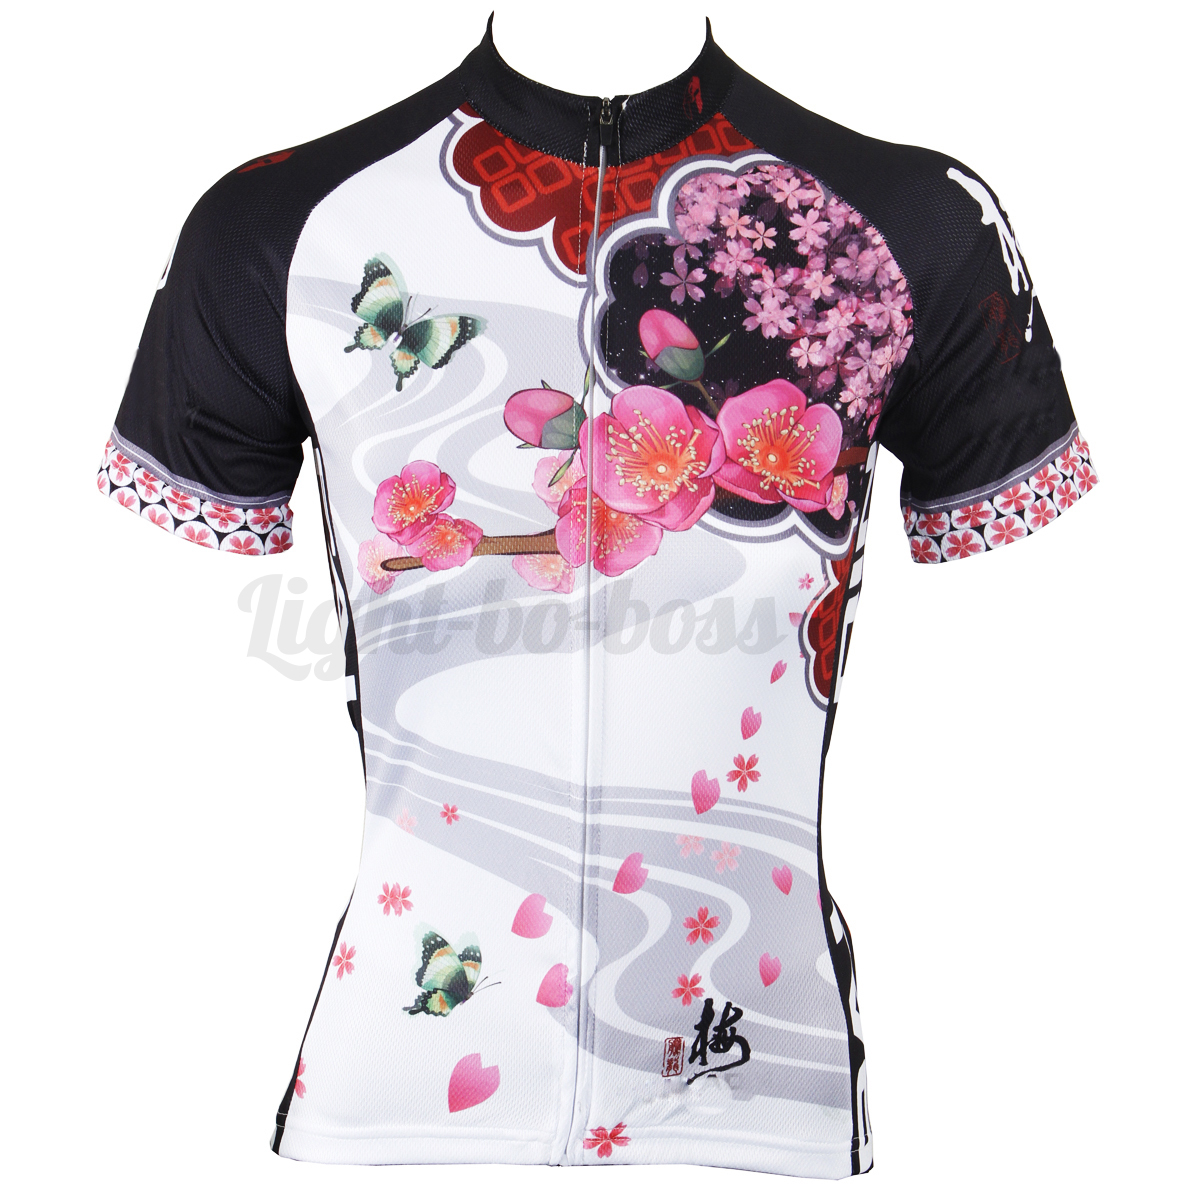 Women-039-s-Cycling-Jersey-Ladies-Short-Sleeve-Cycling-Bike-Bicycle-Shirt-Quick-Dry thumbnail 8